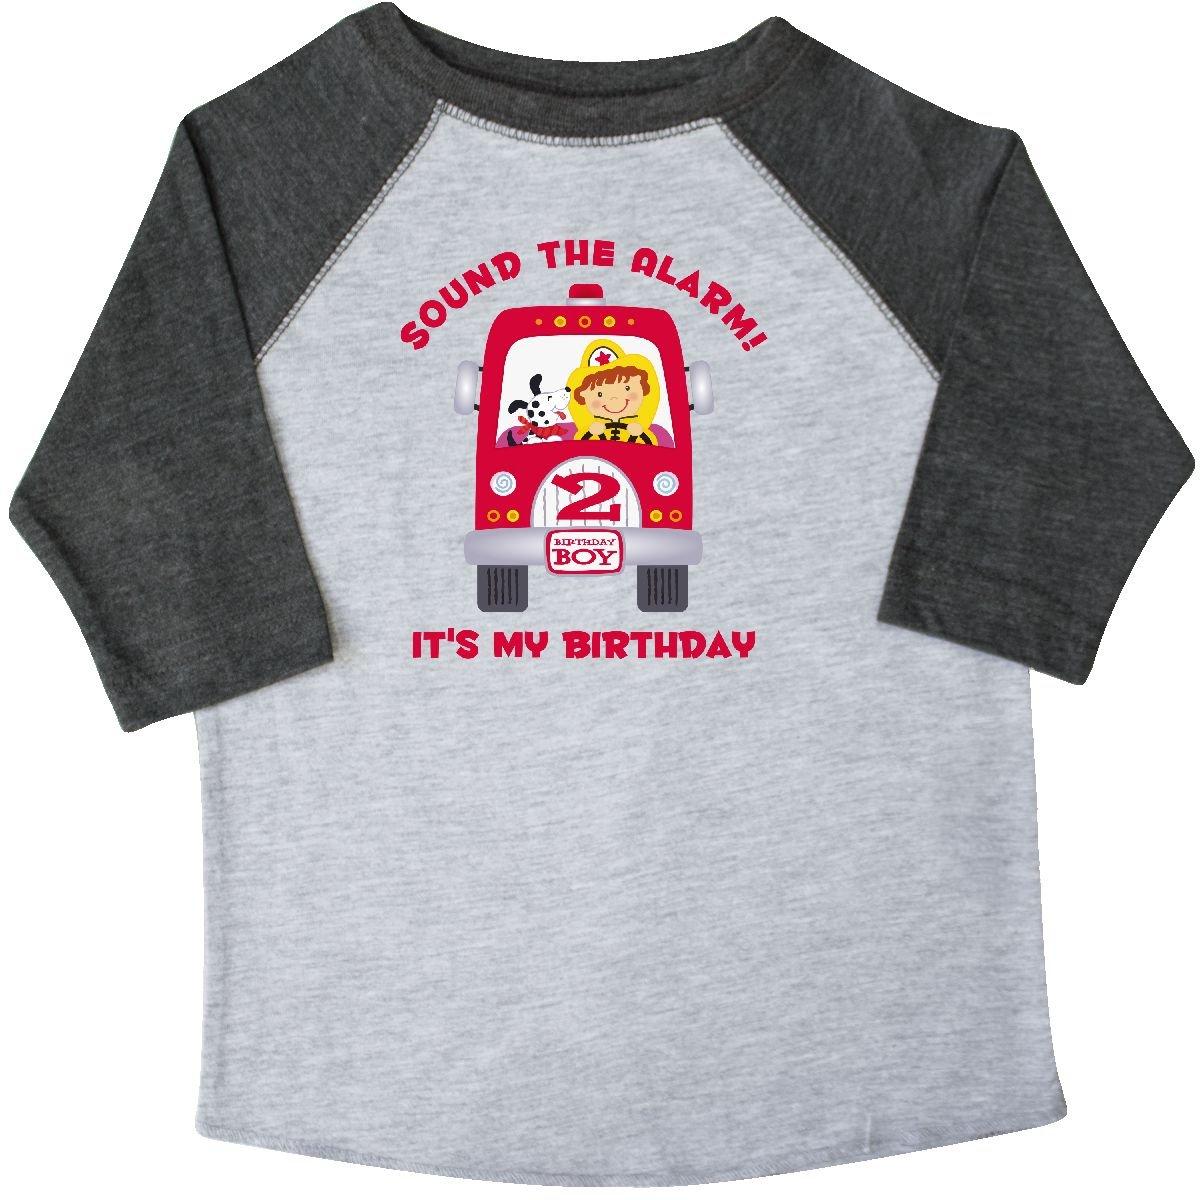 Birthday Boy Shirt 3t